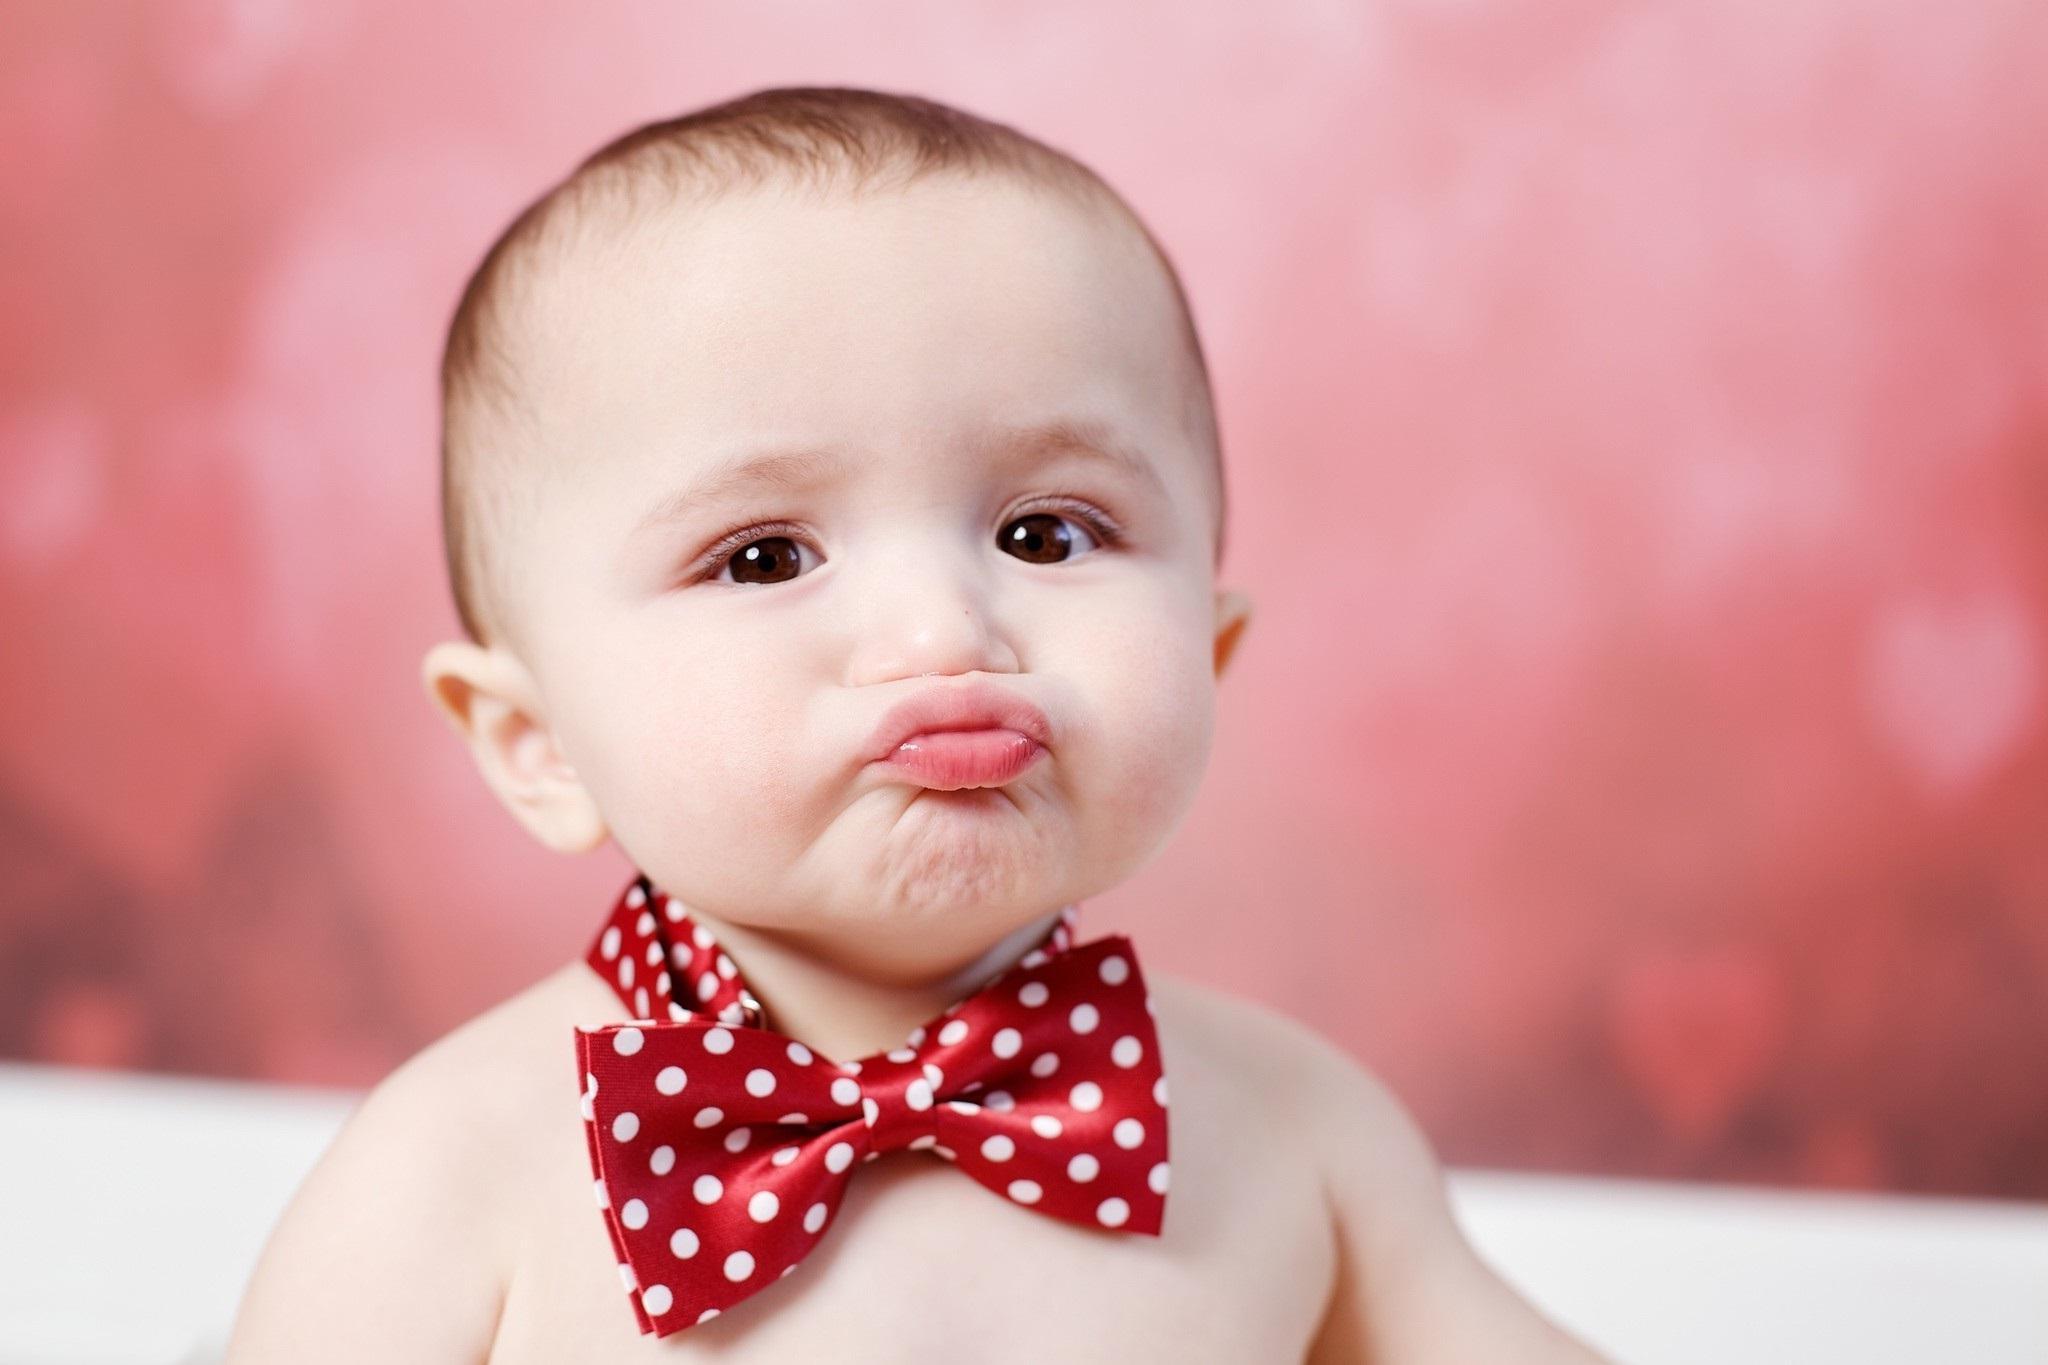 Handsome Baby Boy Wallpaper Wallpaper Backgrounds 2048x1365